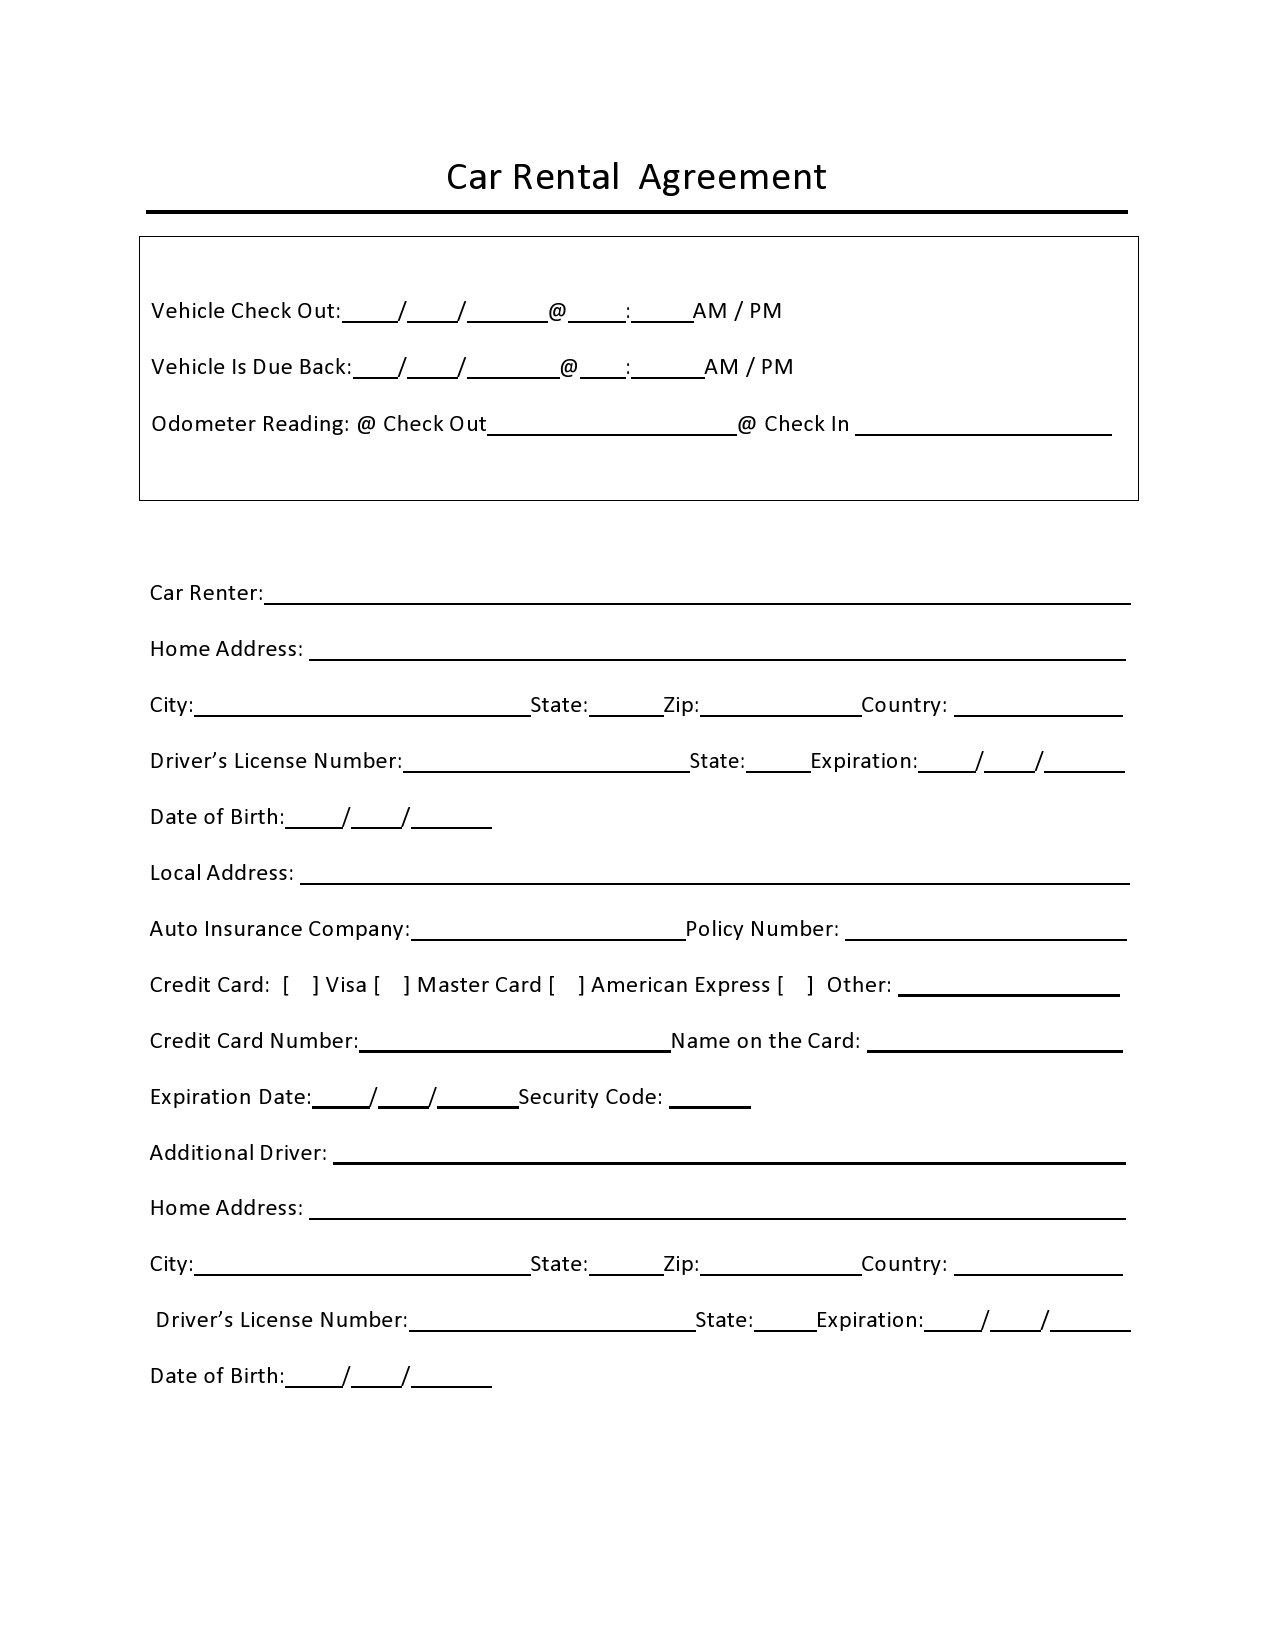 Free car rental agreement 07